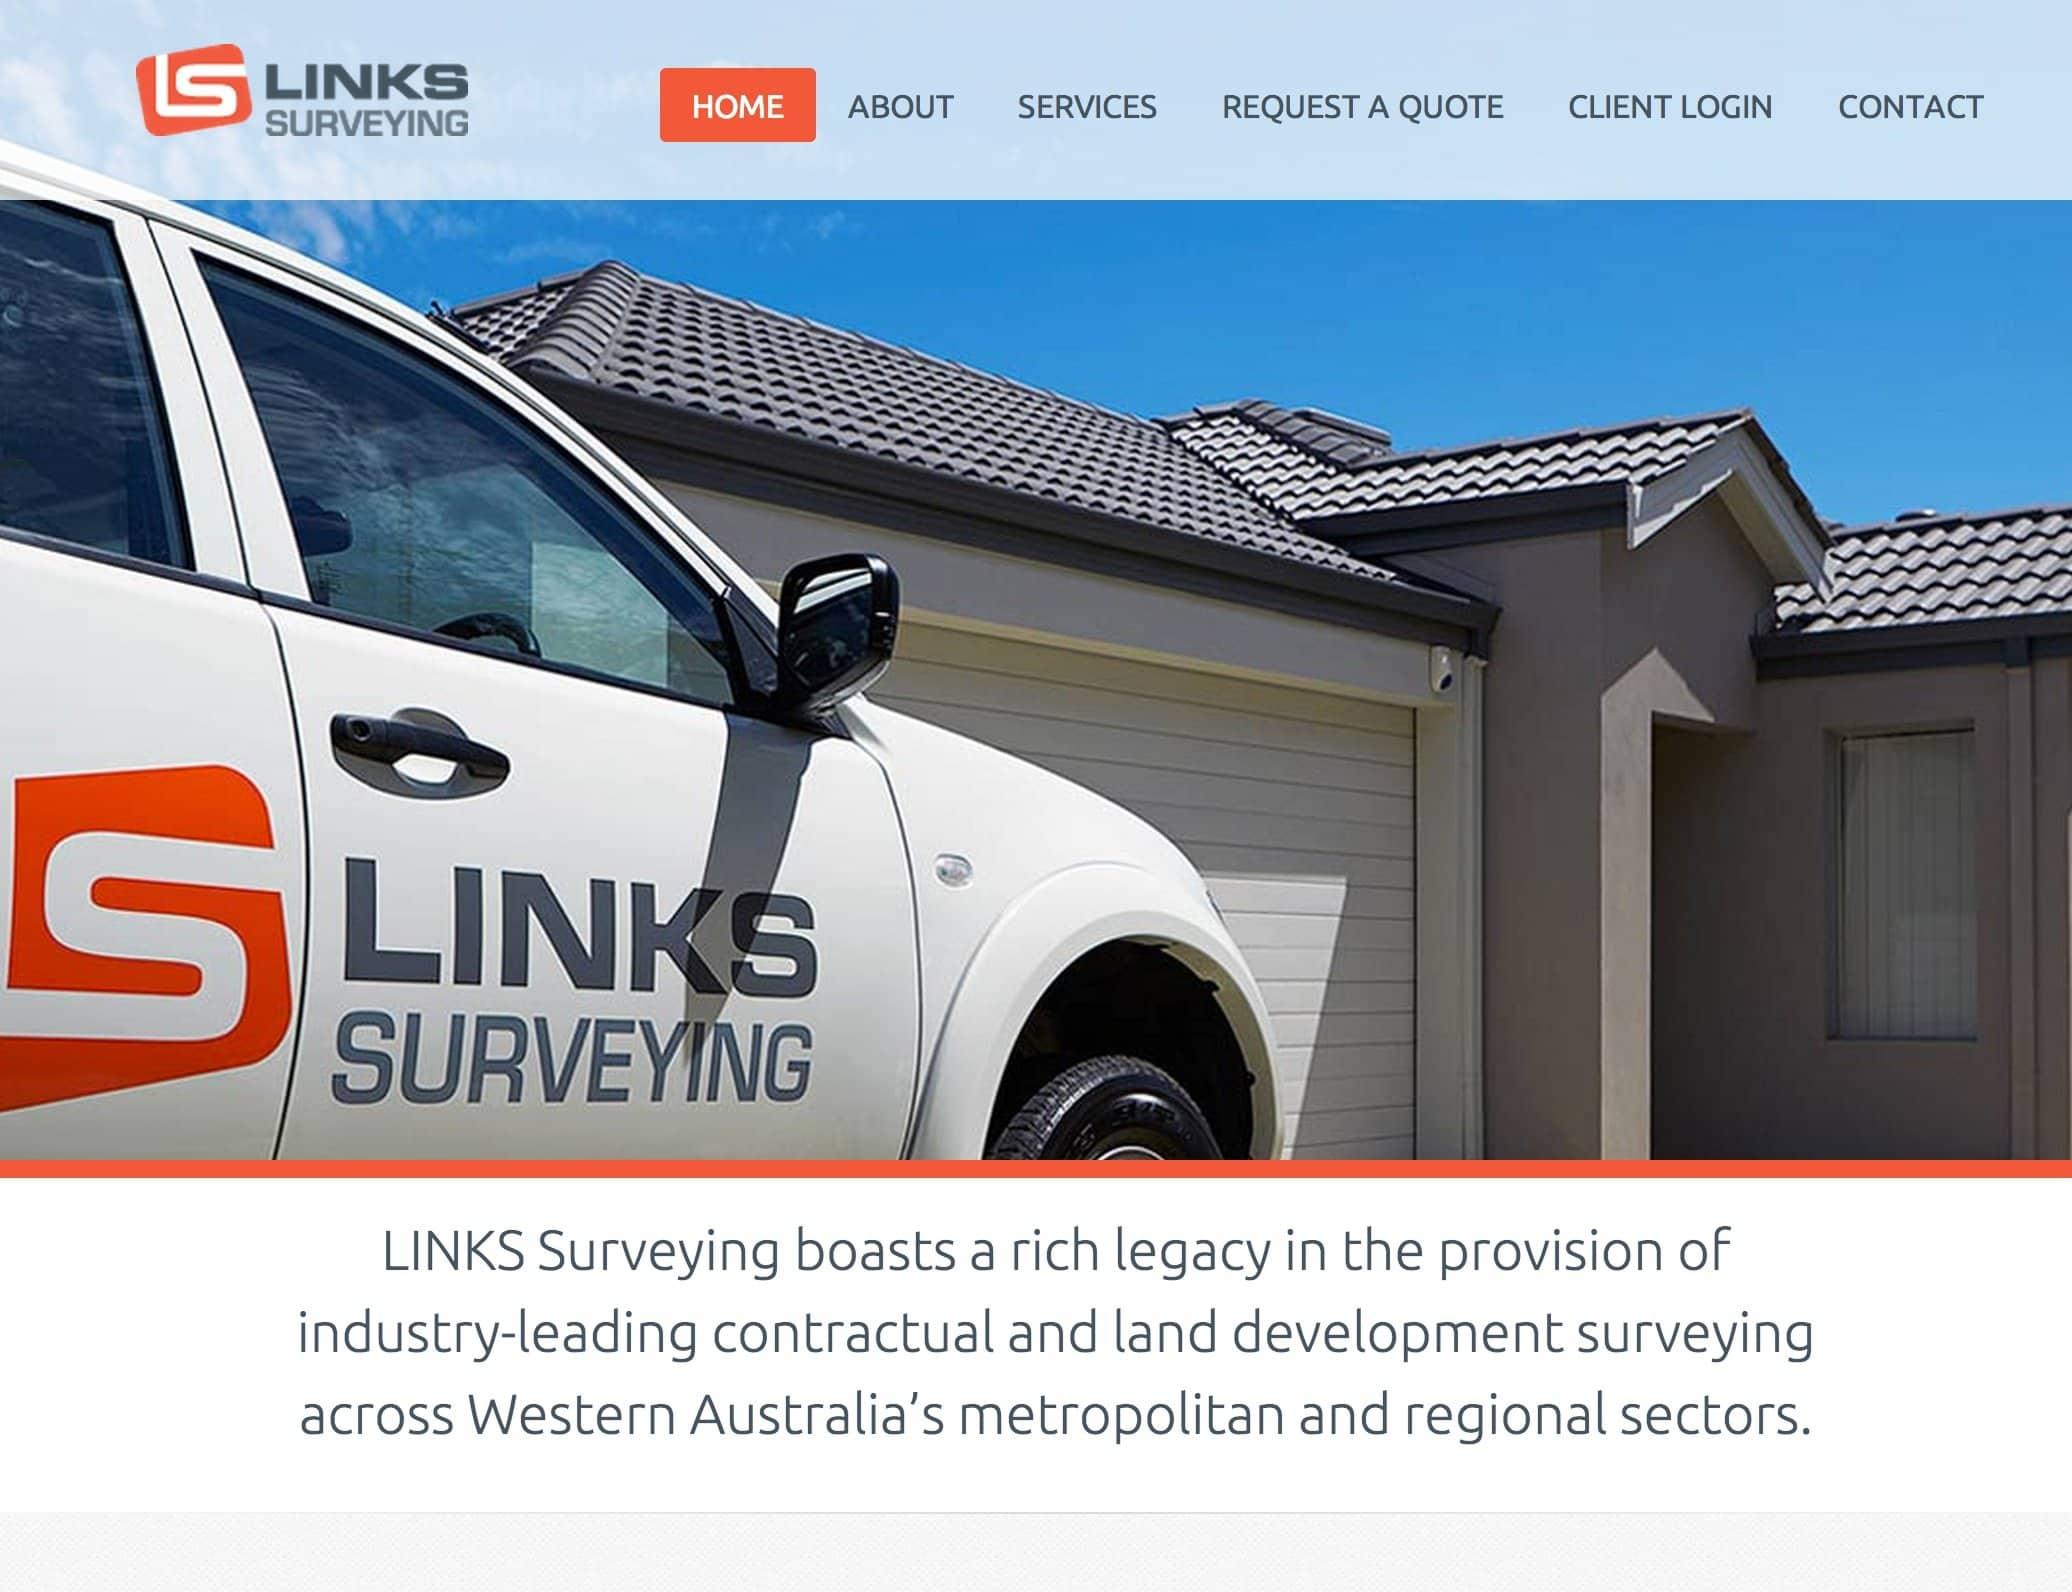 Links Surveying new website